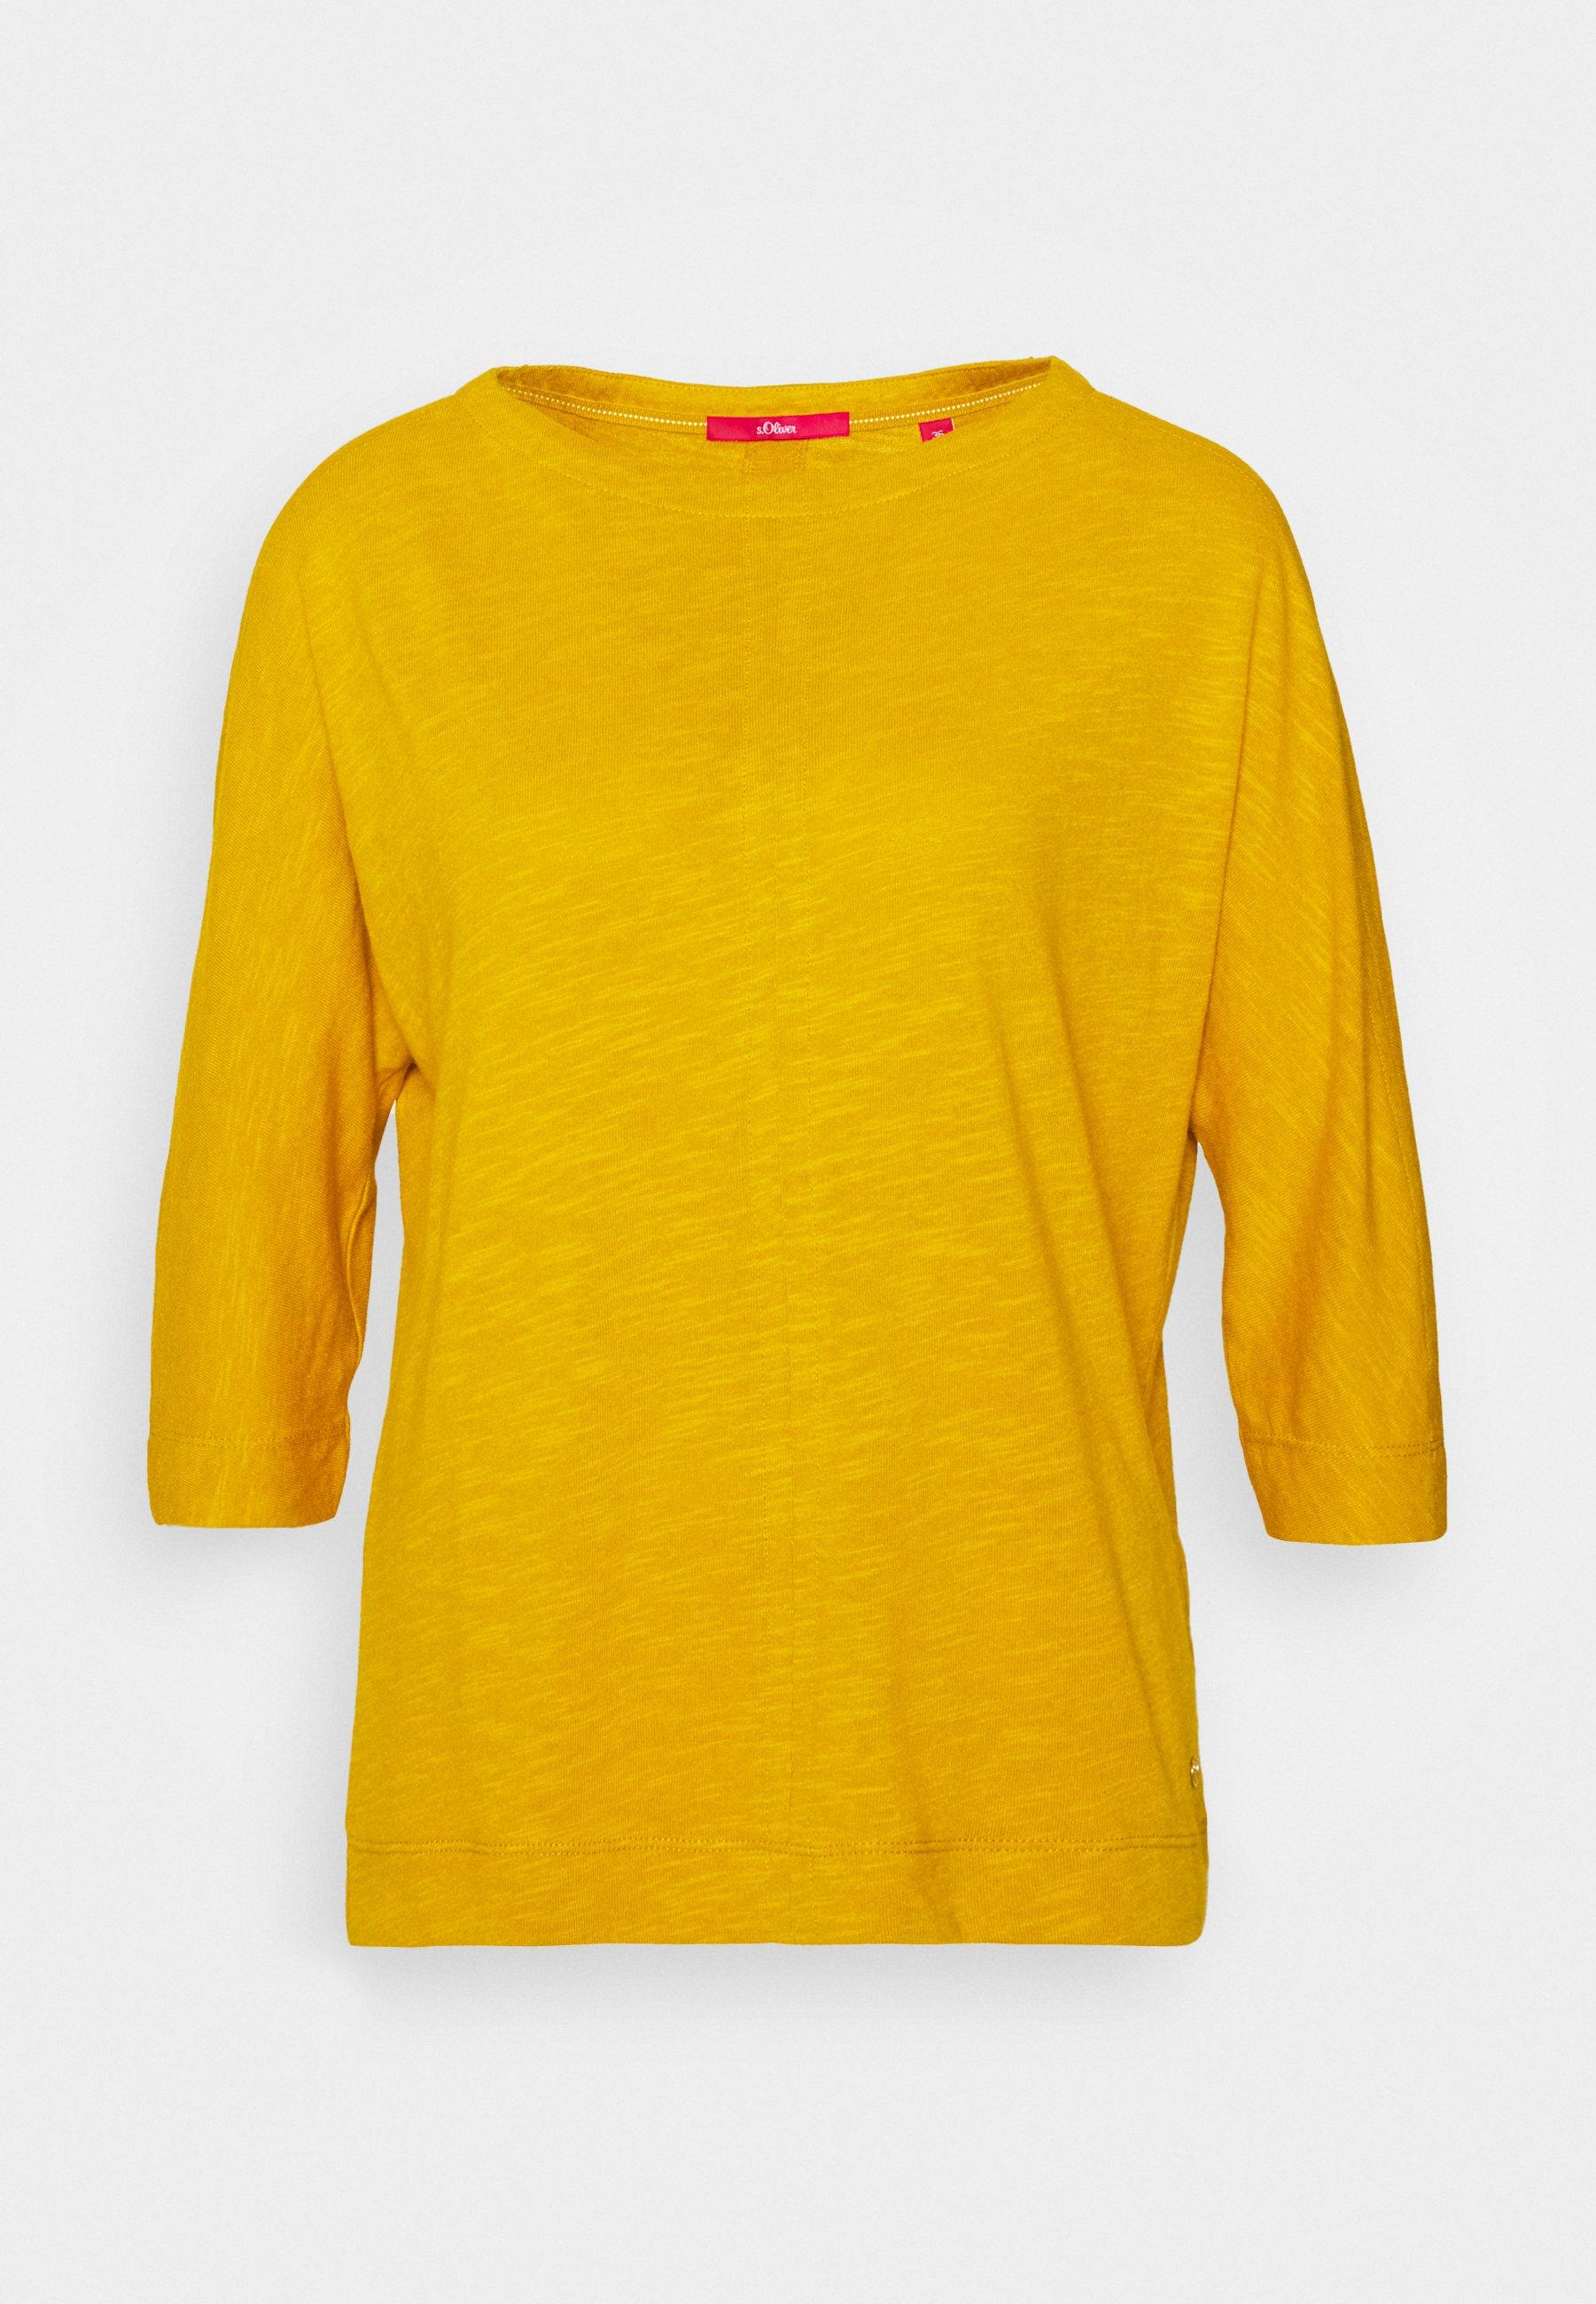 S.oliver Topper Langermet - Yellow/gul